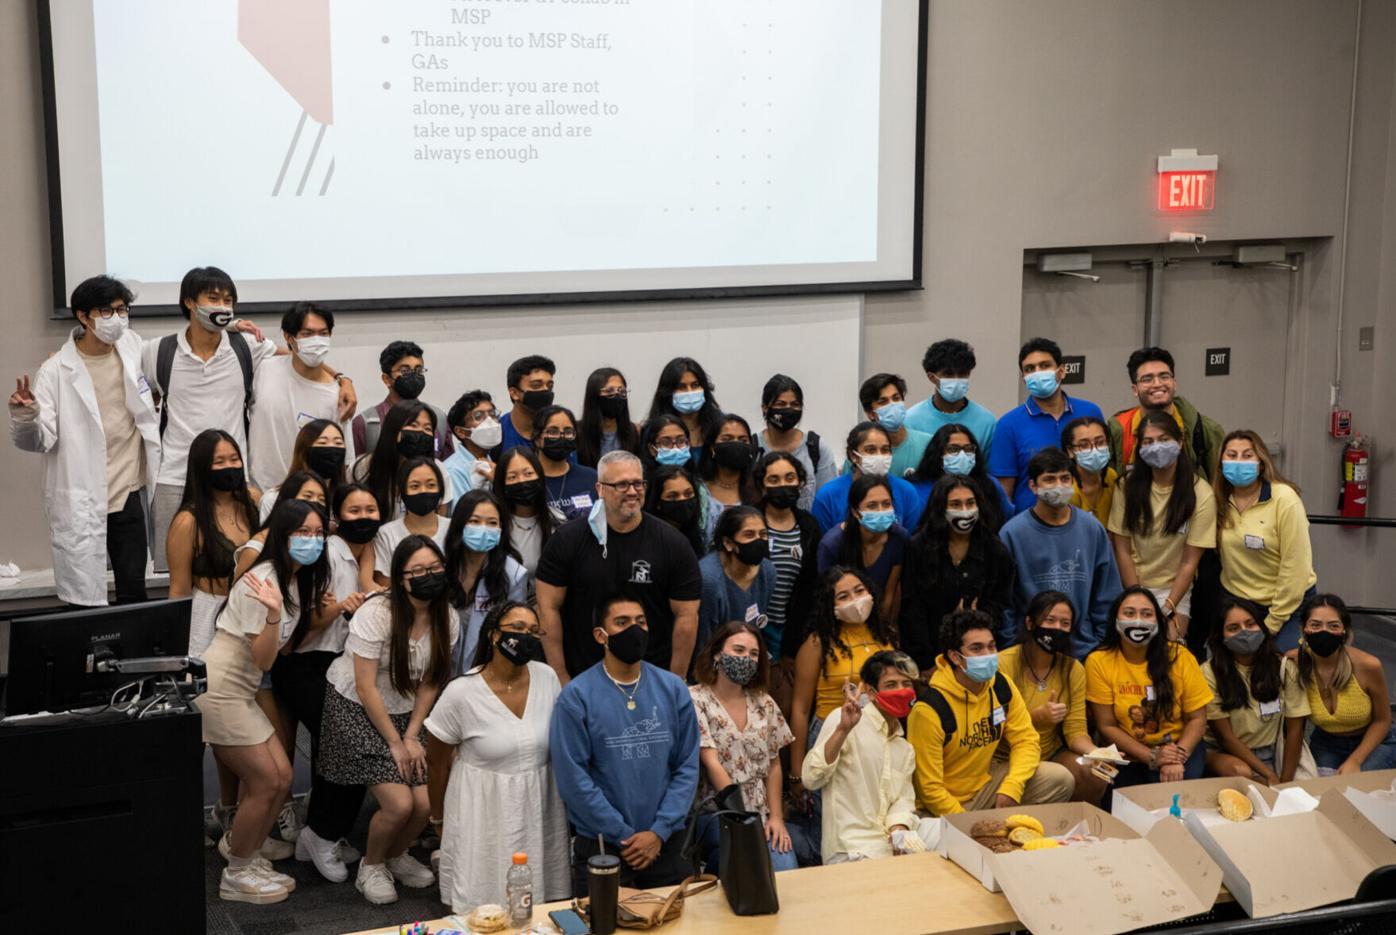 PHOTOS: UGA multicultural organizations host collaborative event